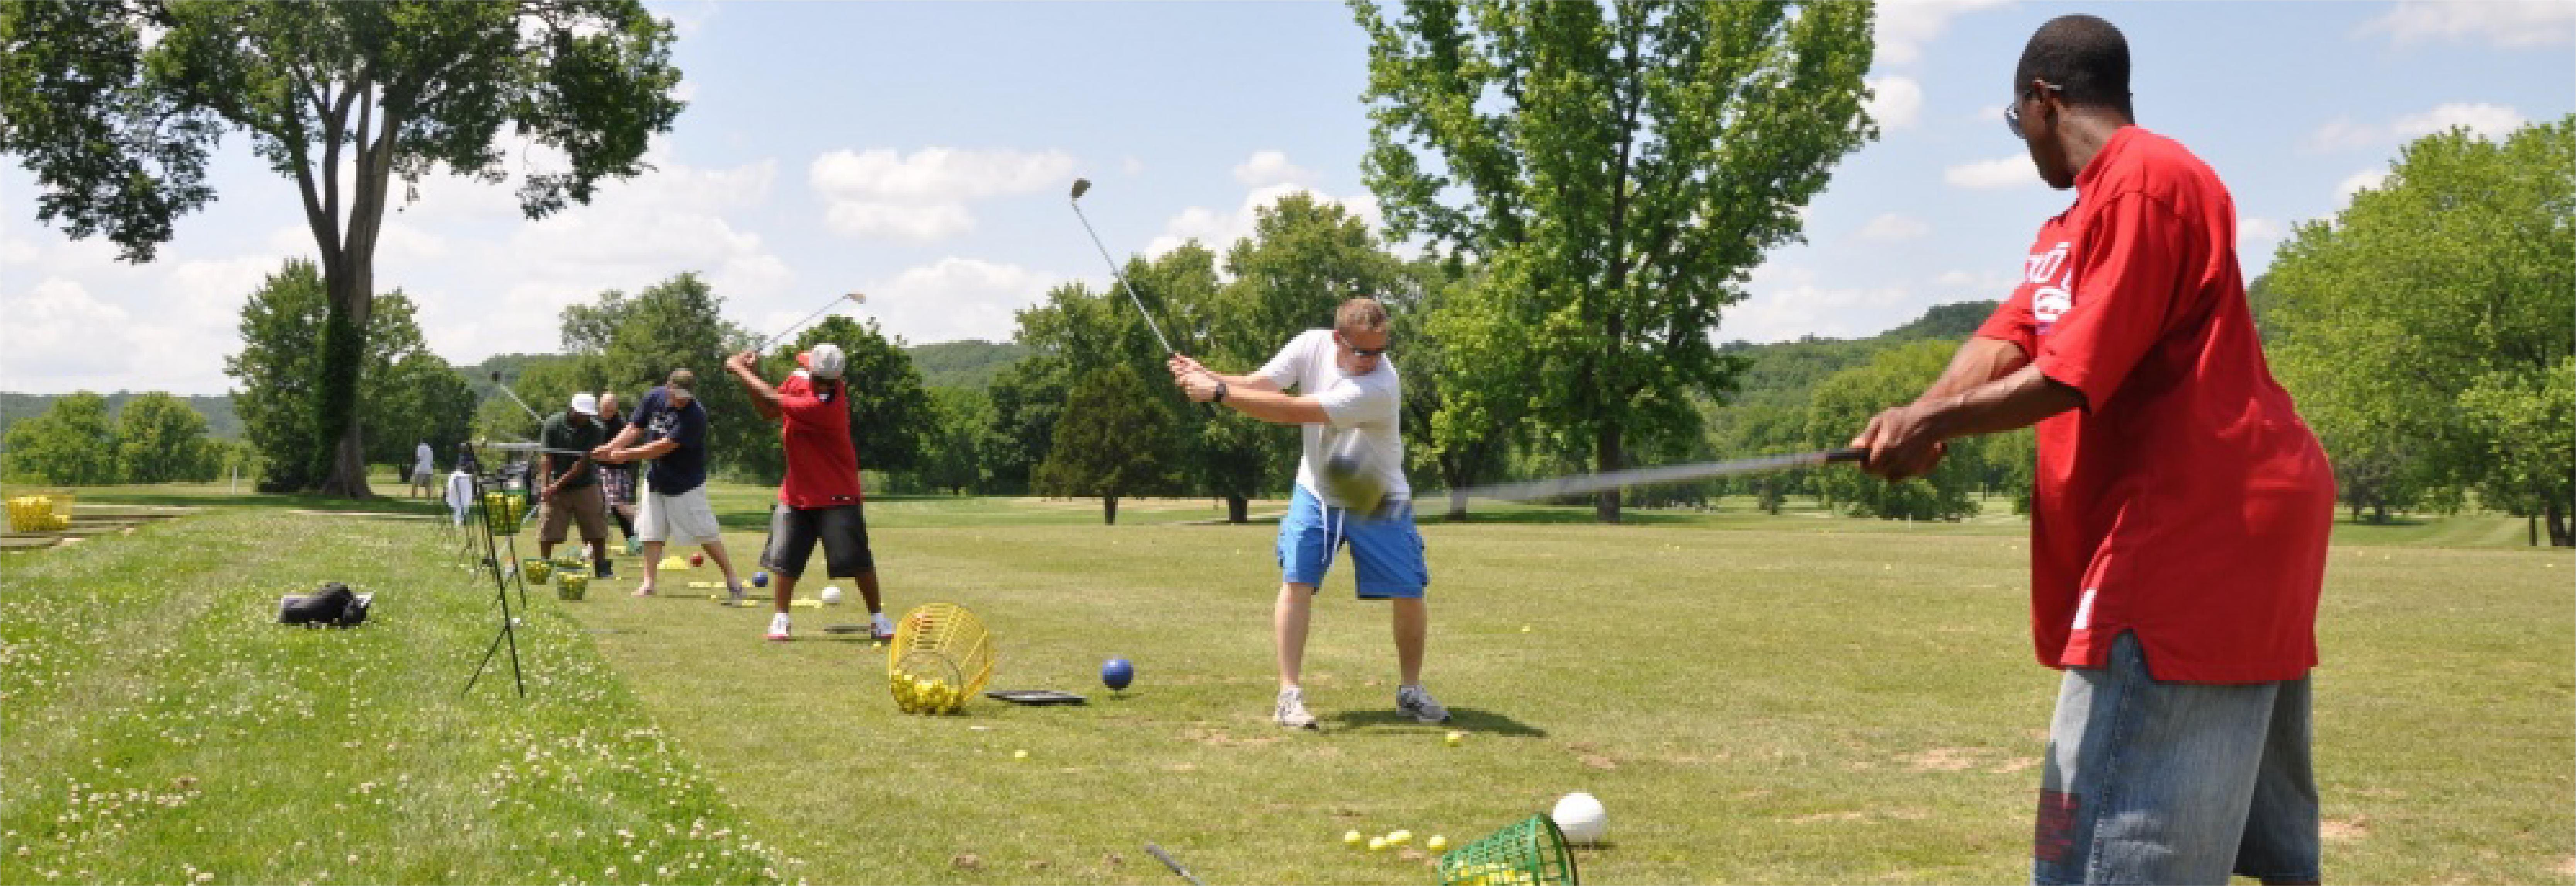 Fort Leonard Wood Golf Course